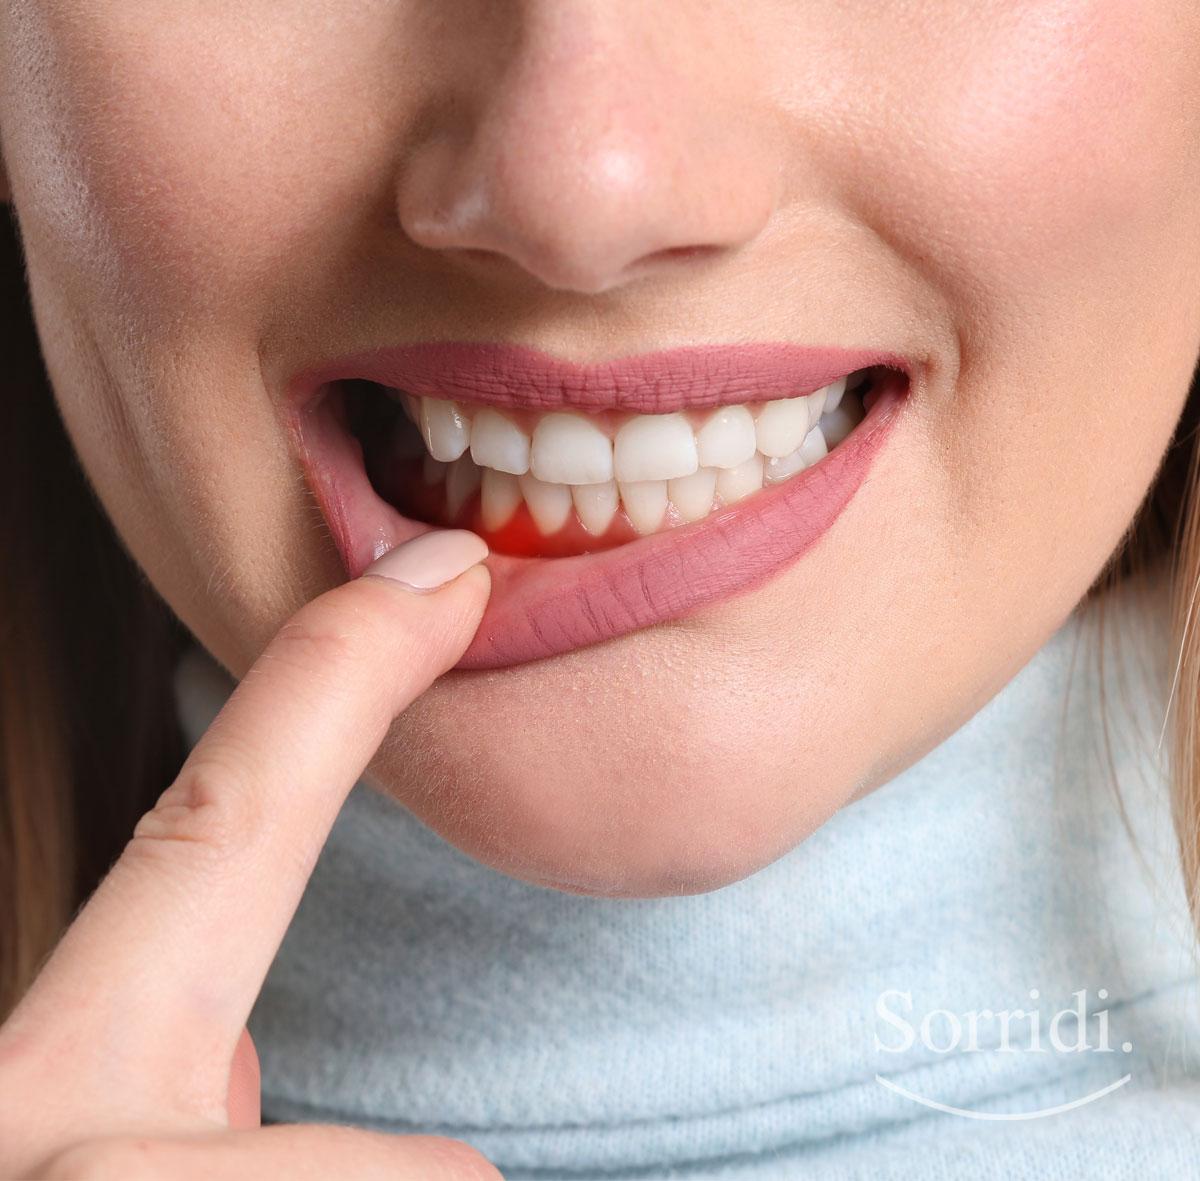 Sorridi-ch-magazine-diabete-e-parodontite